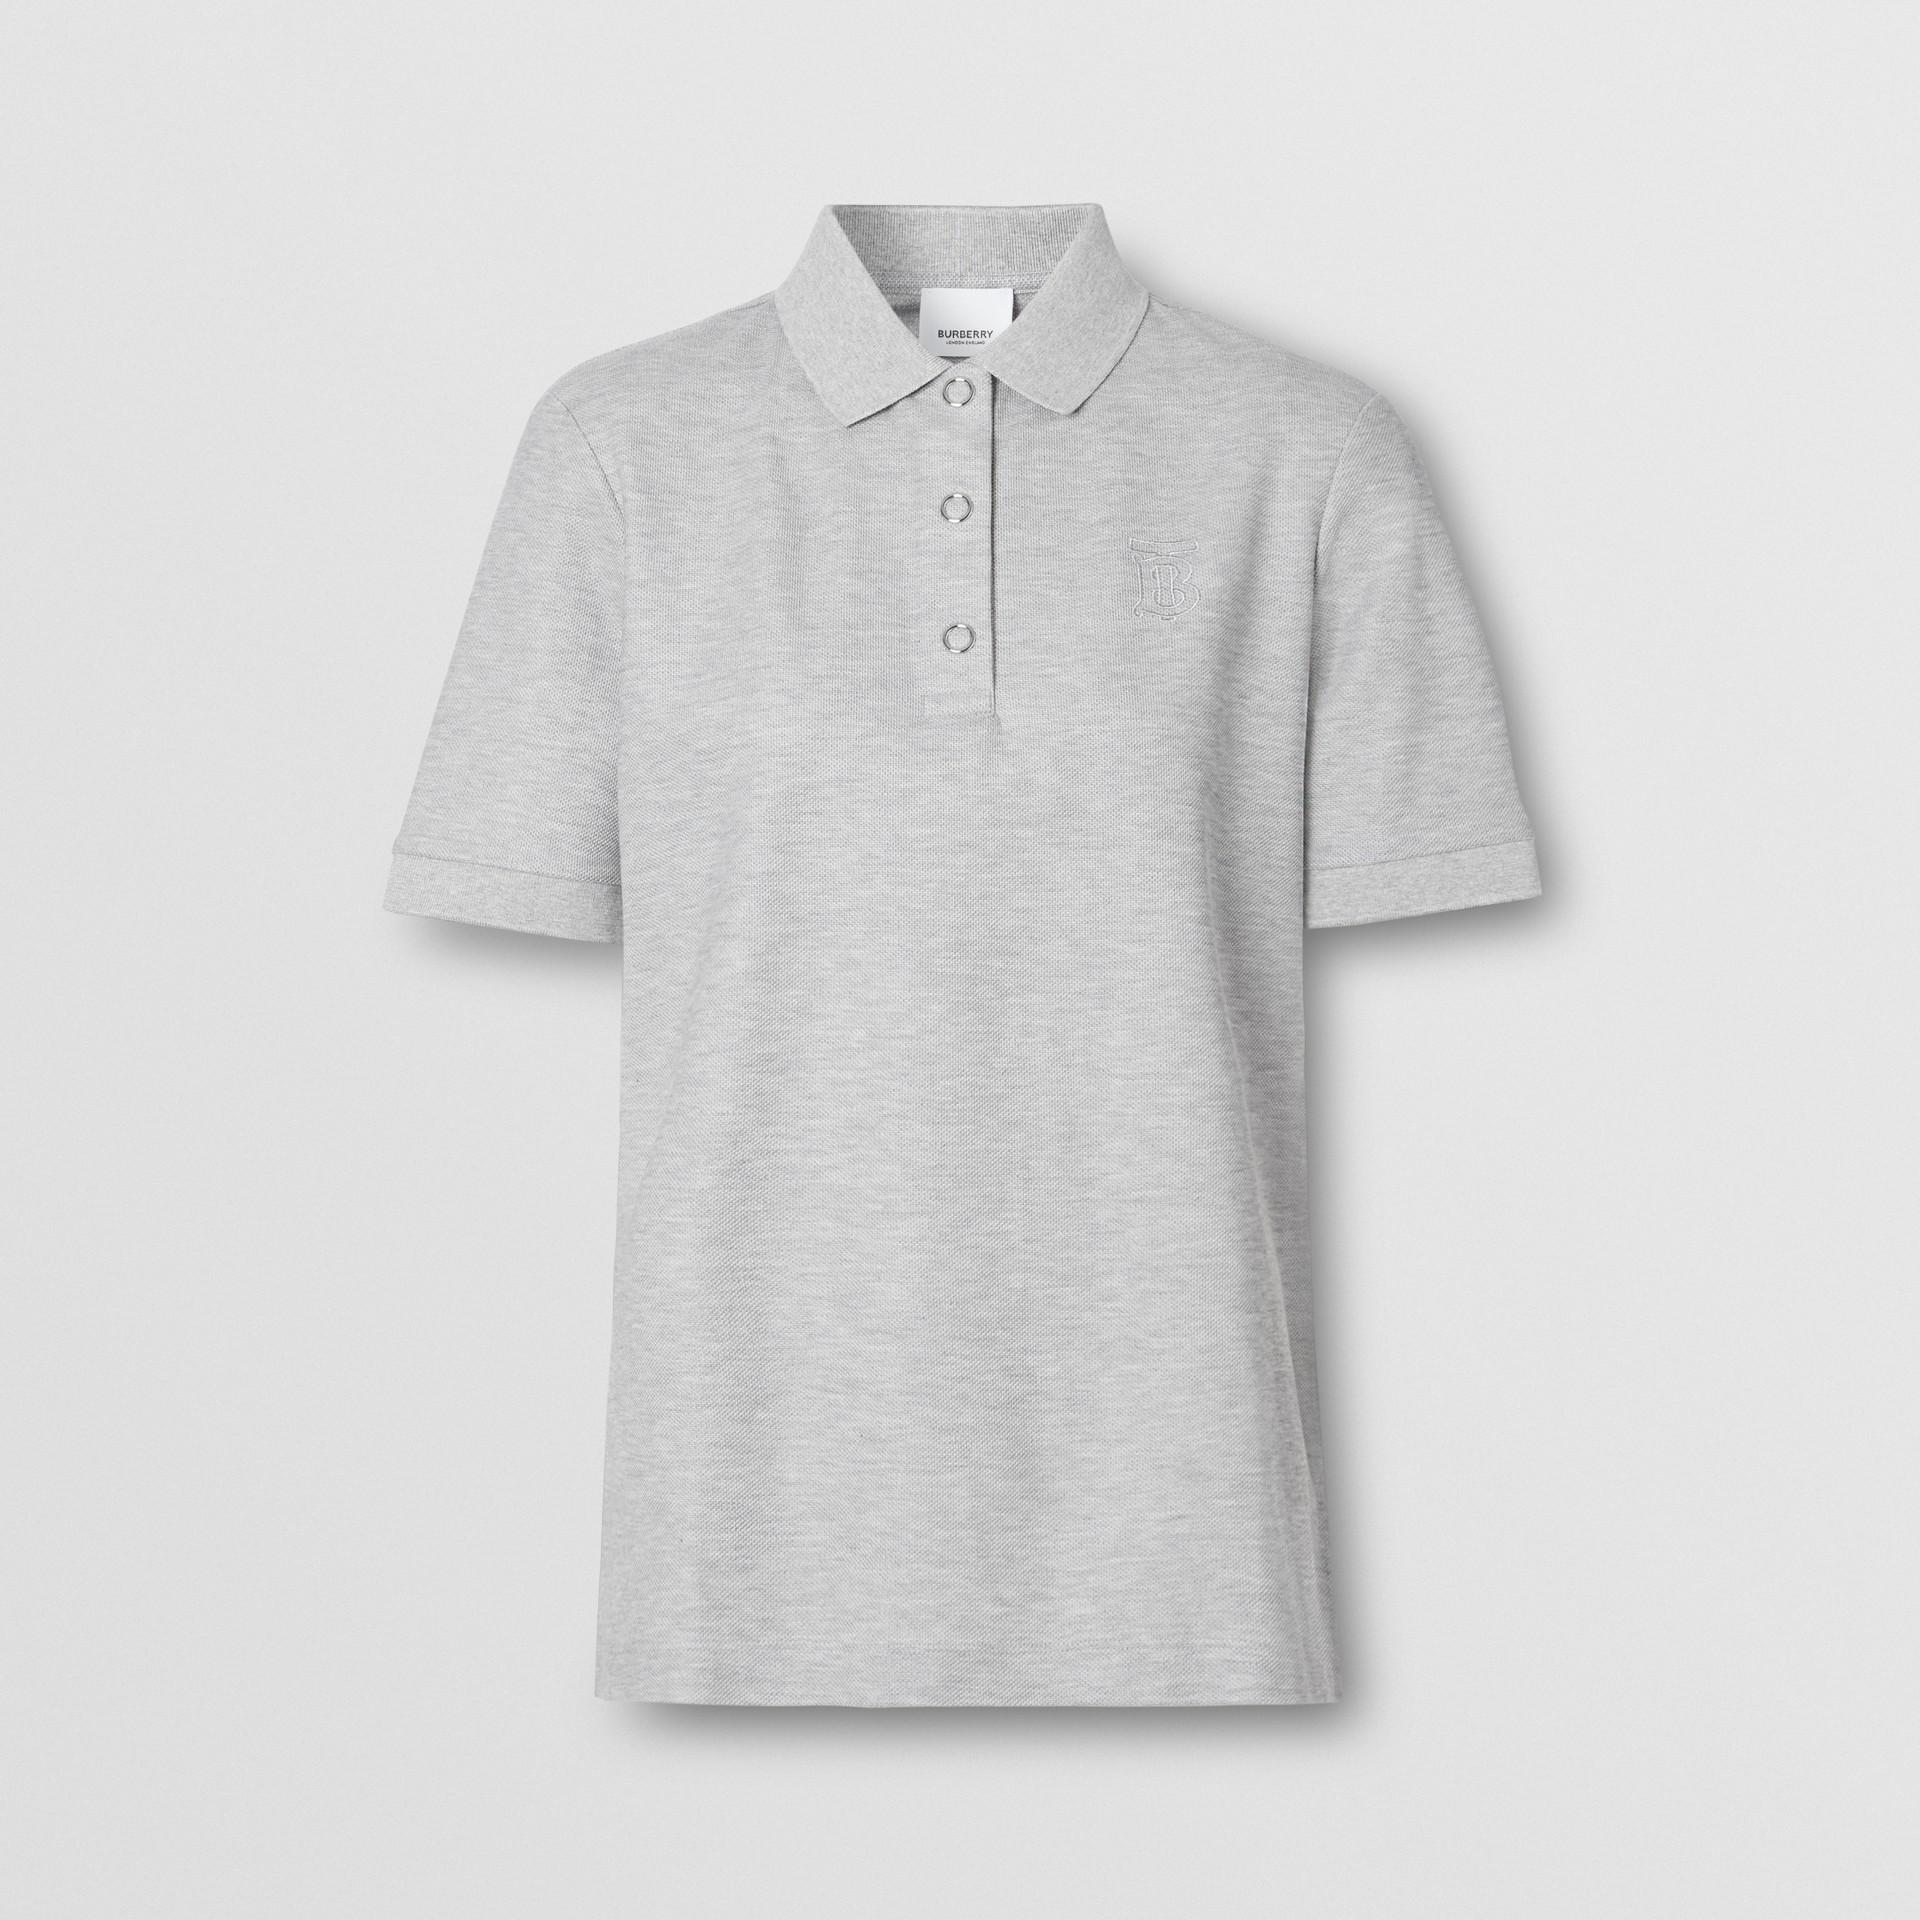 Monogram Motif Cotton Piqué Polo Shirt in Pale Grey Melange - Women | Burberry United Kingdom - gallery image 3